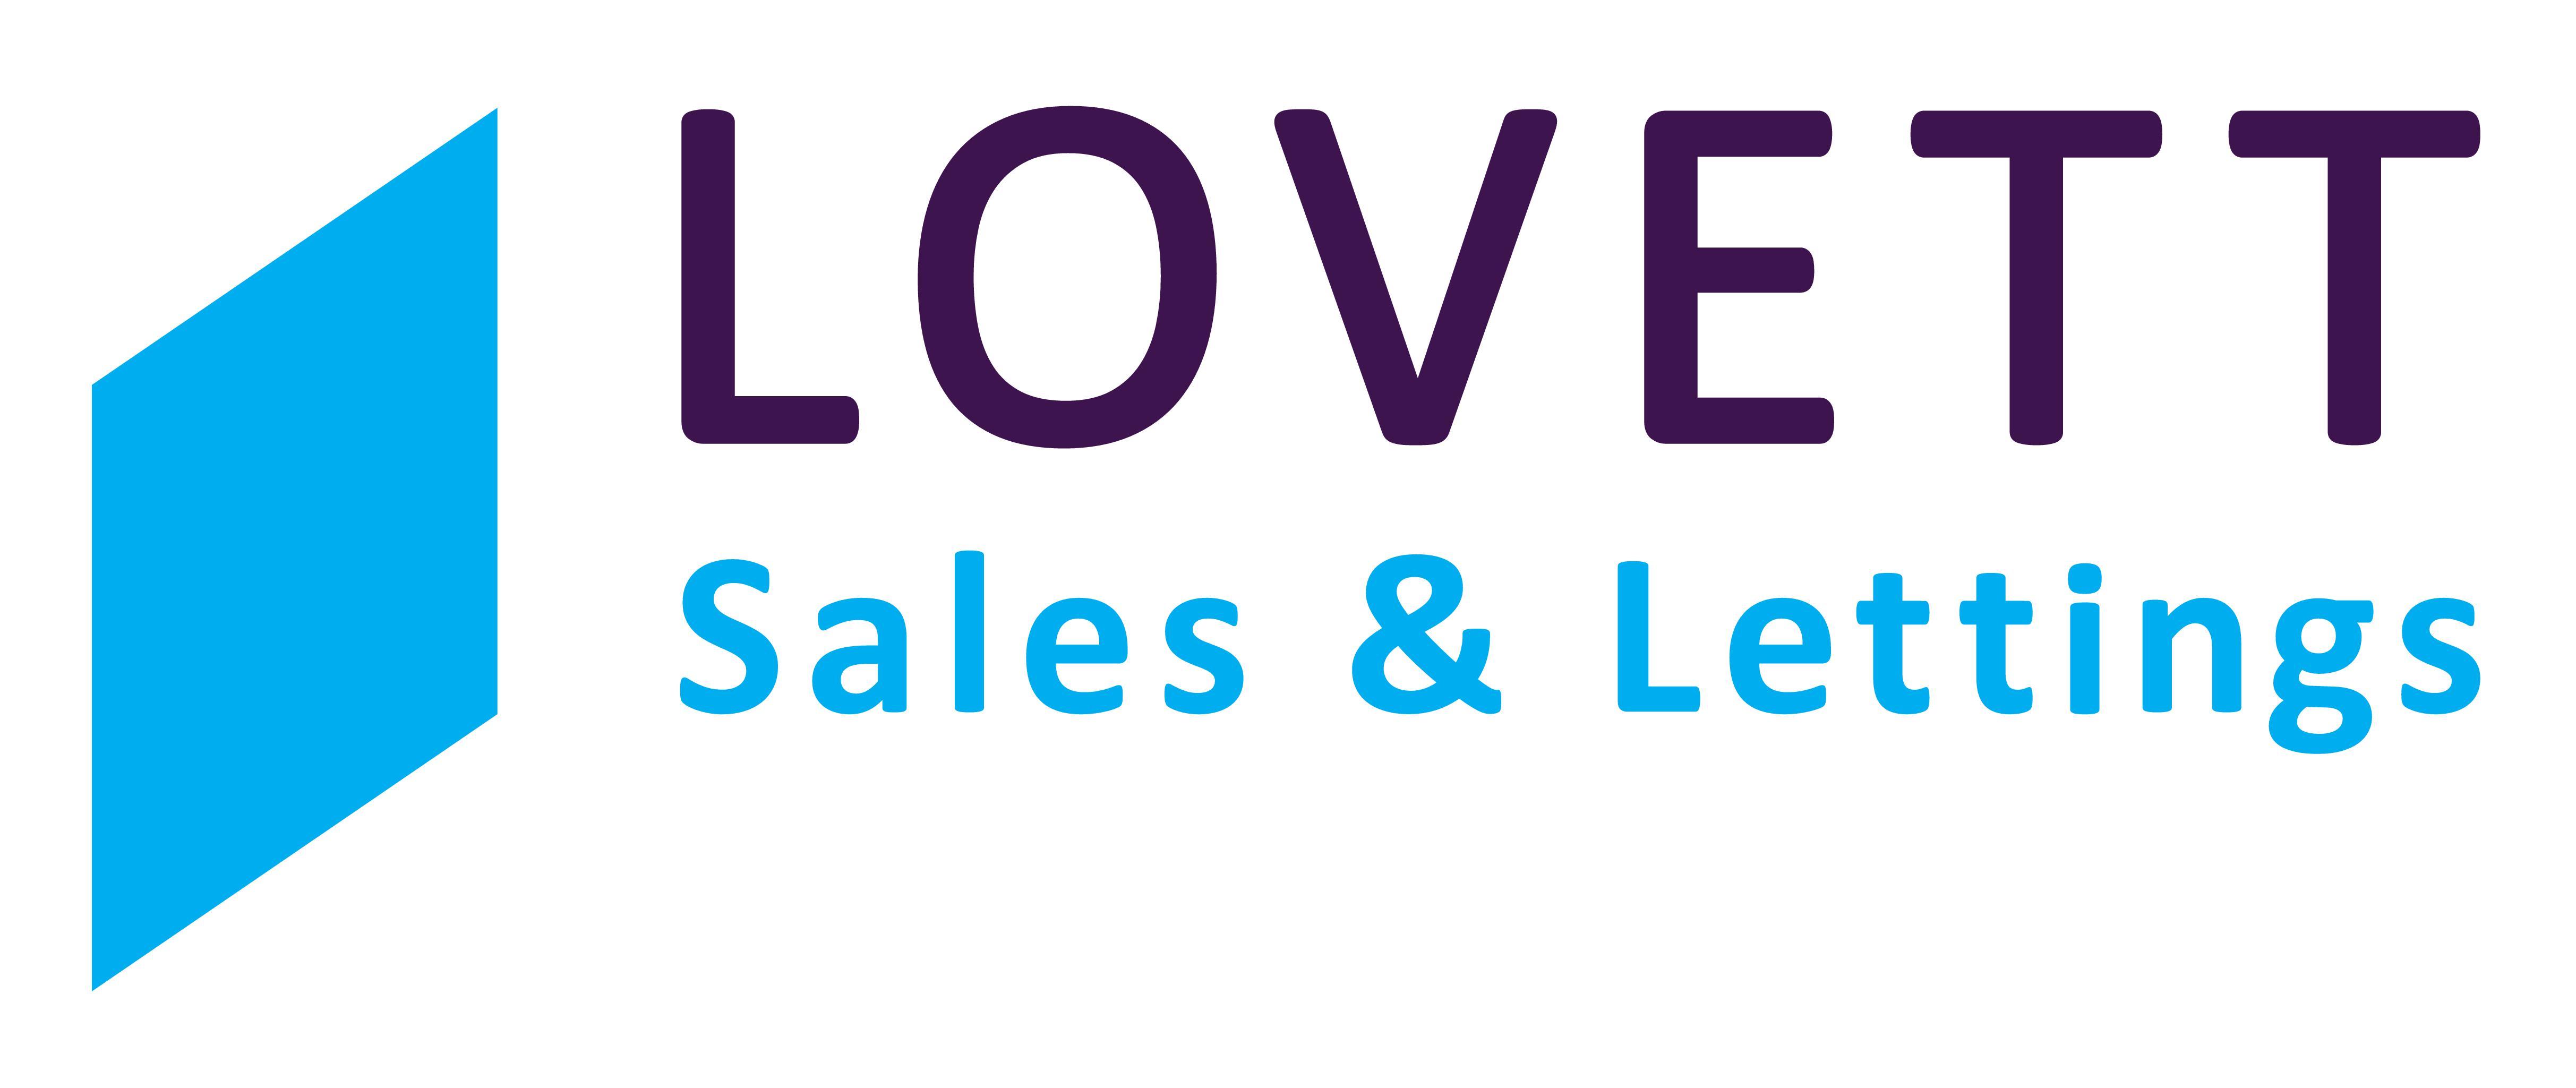 Lovett Sales & Lettings logo